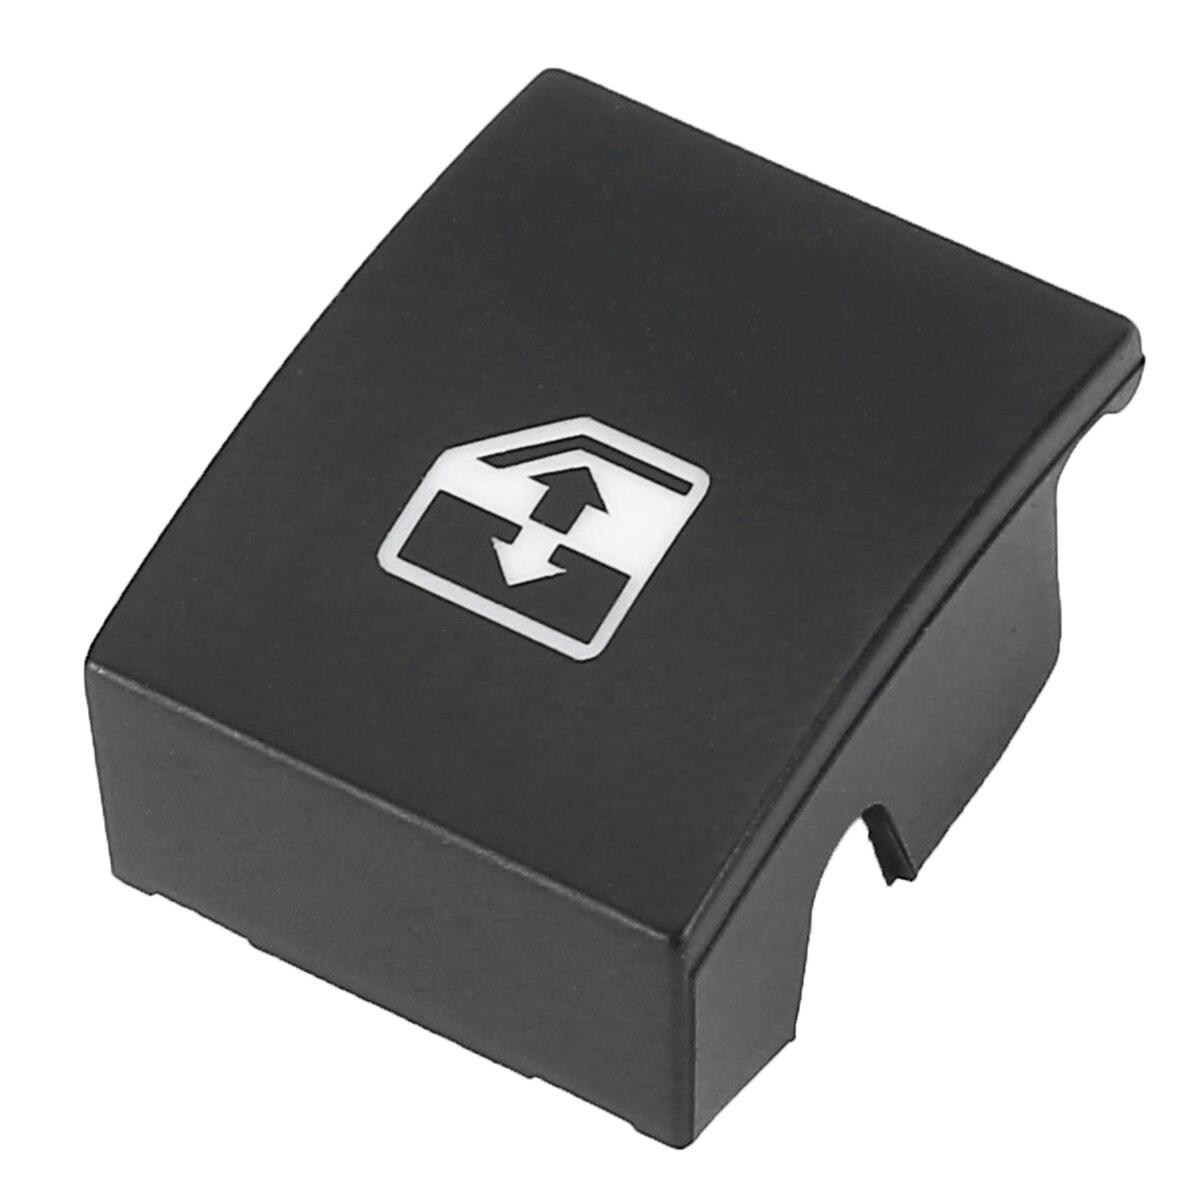 Akozon Luggage Net Fit for Car Boot Universal Luggage Storage Hook Bag Nylon Plastic Black 100 x 40 cm